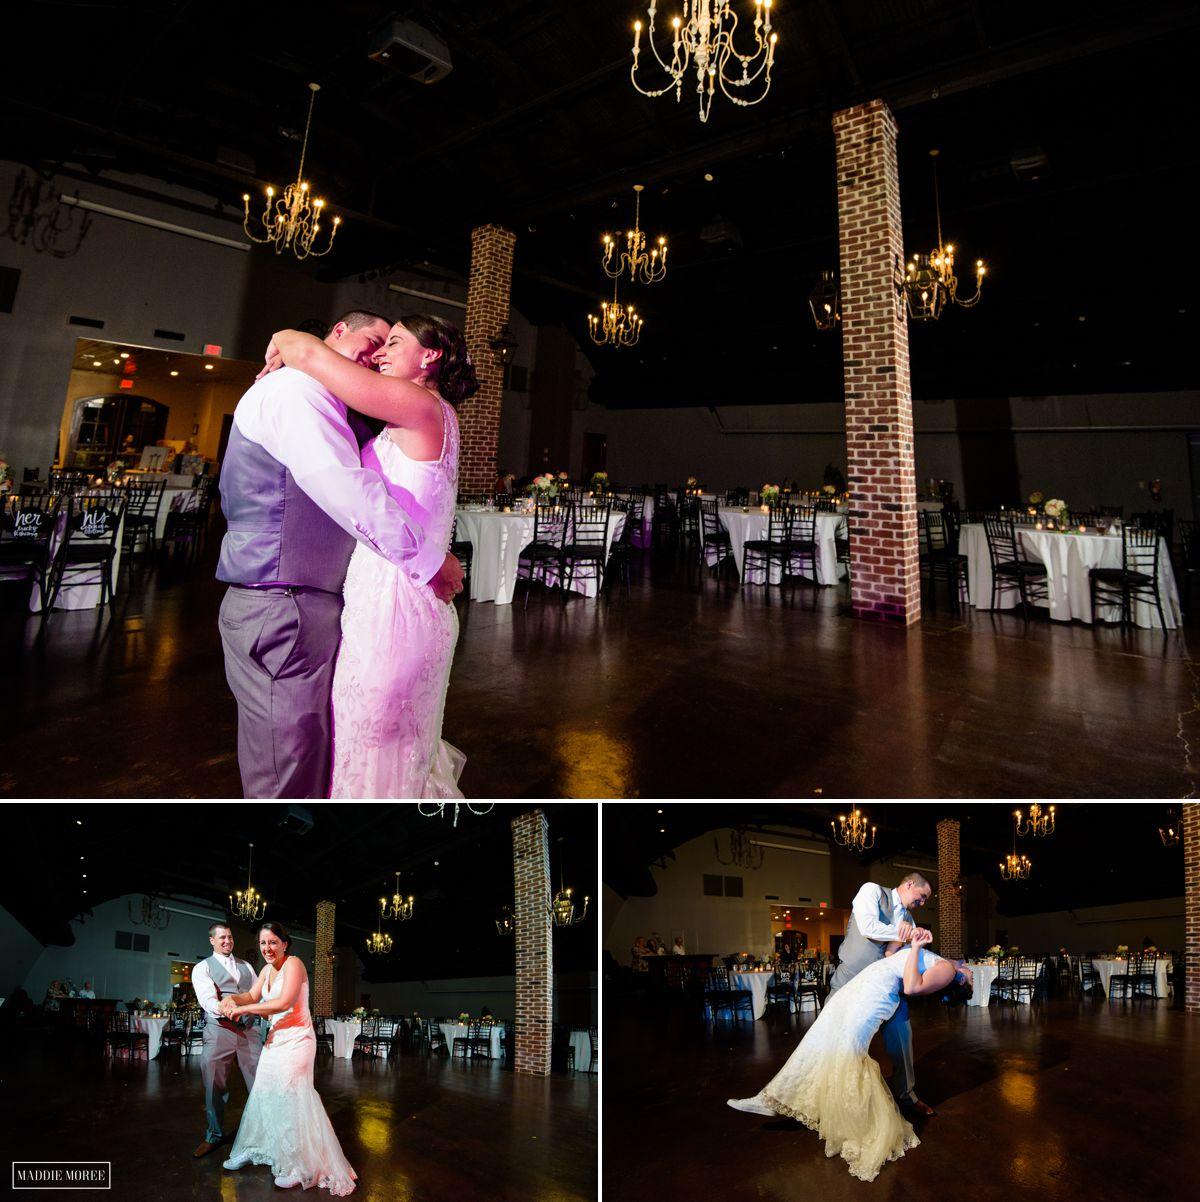 Reception bride and groom last dance